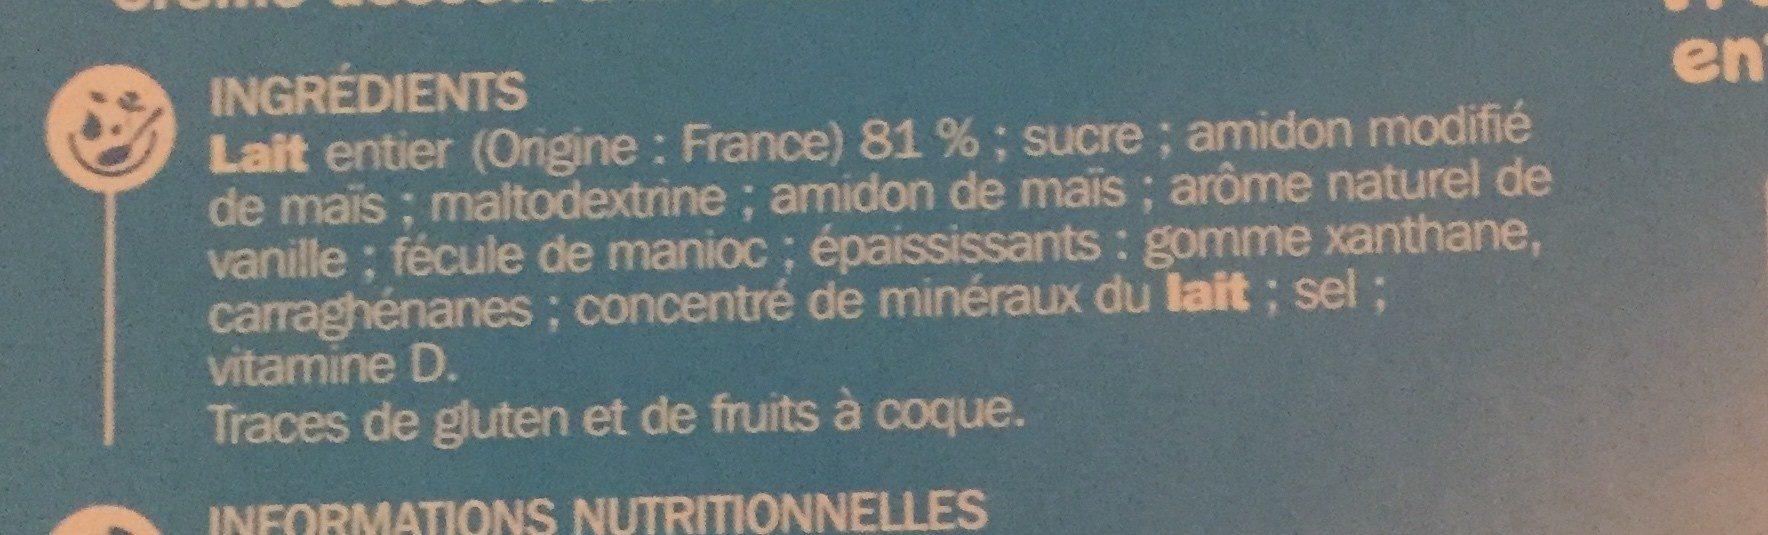 Goûters lactés saveur vanille en gourde - Ingredients - fr